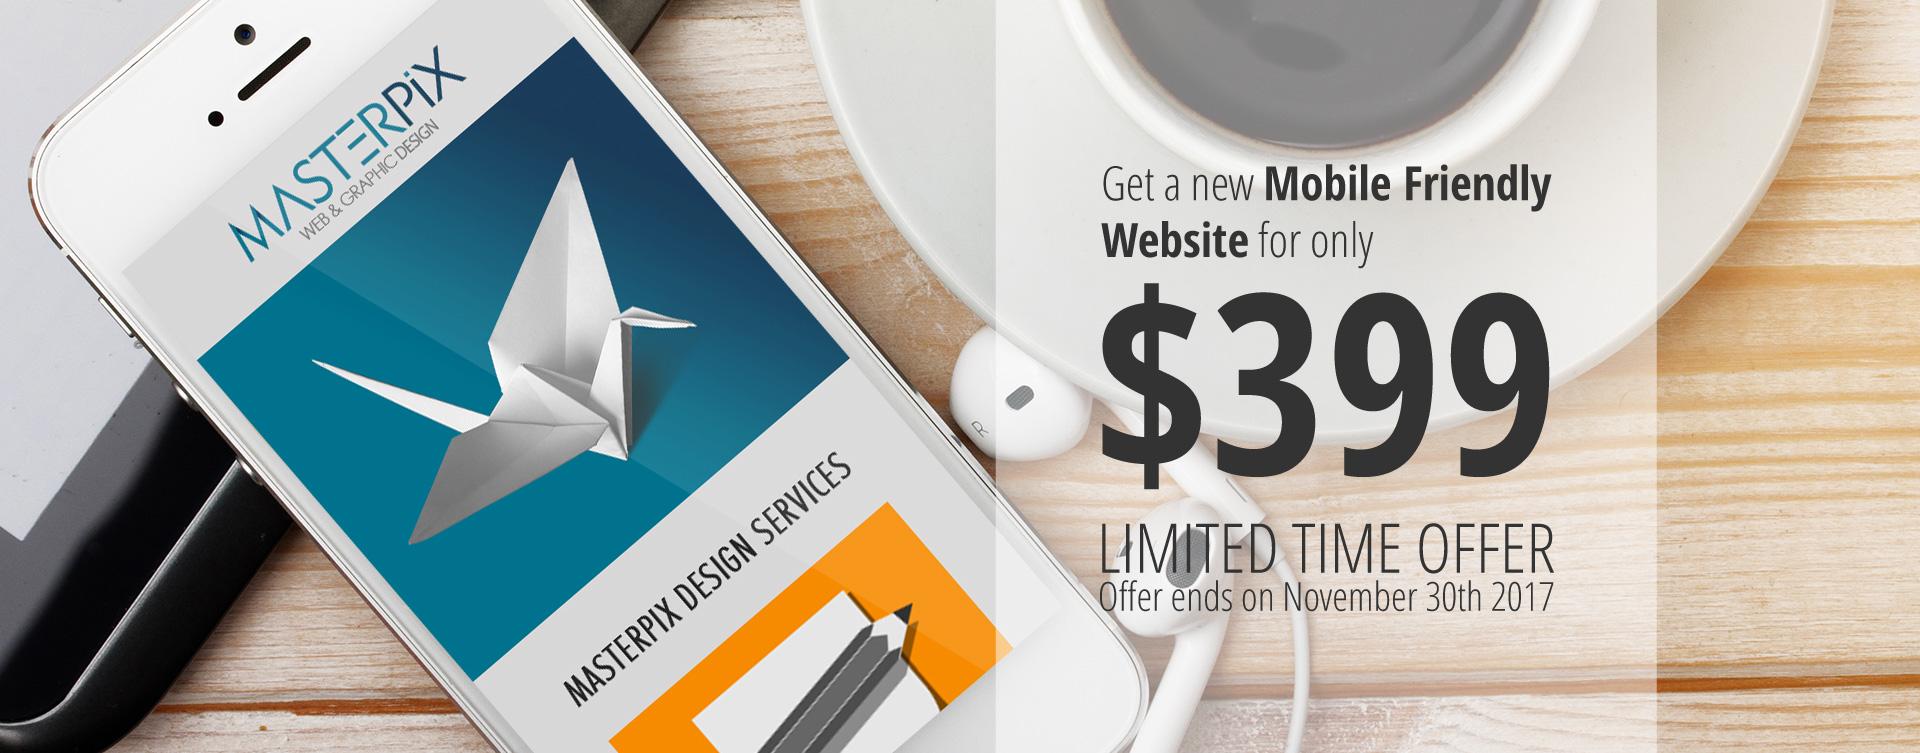 mastrepix_website_design_promotion_nov17